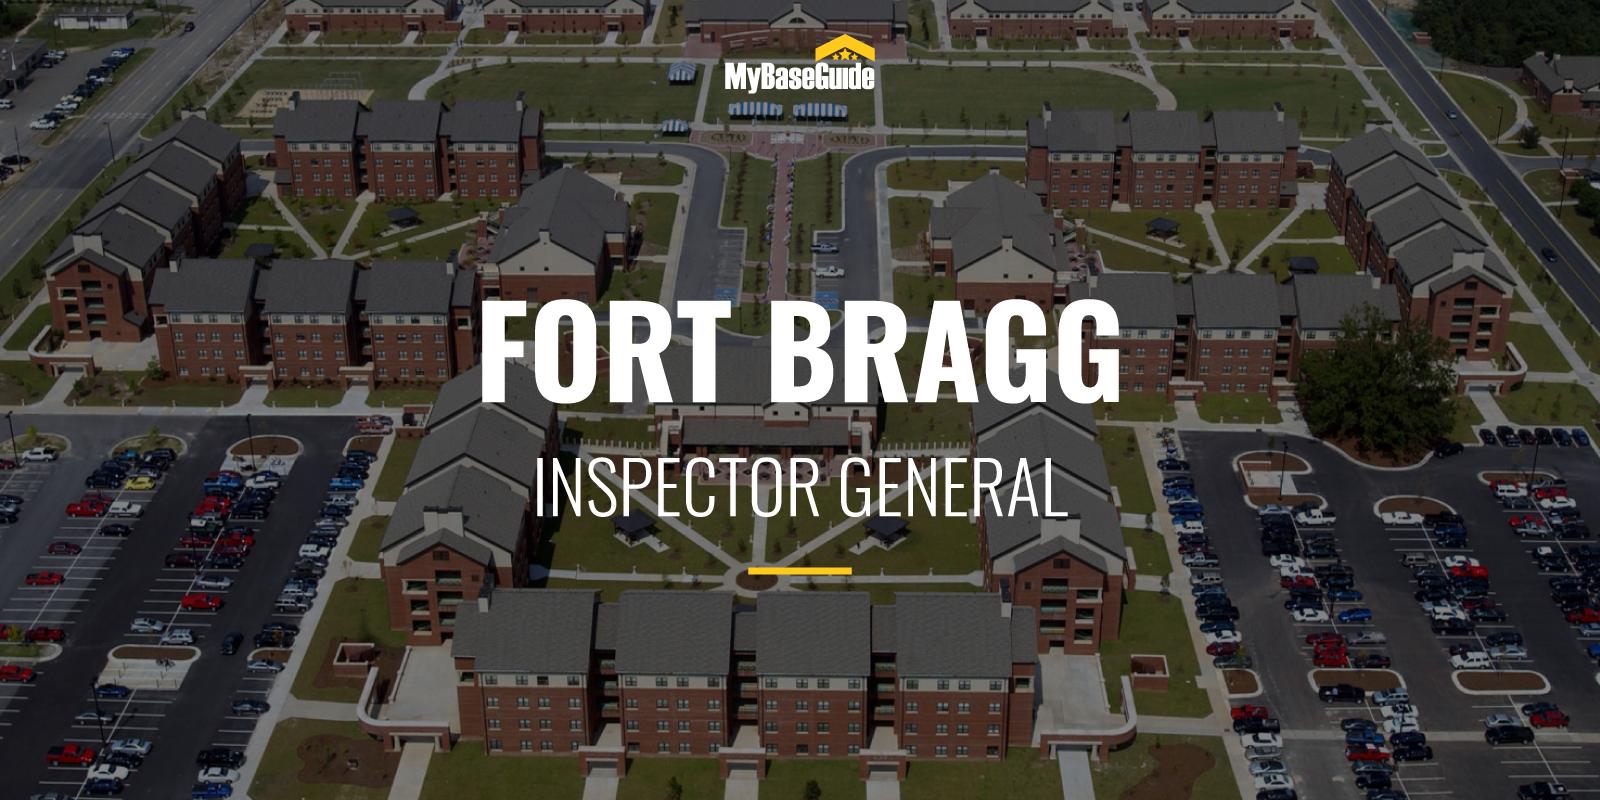 Fort Bragg Inspector General